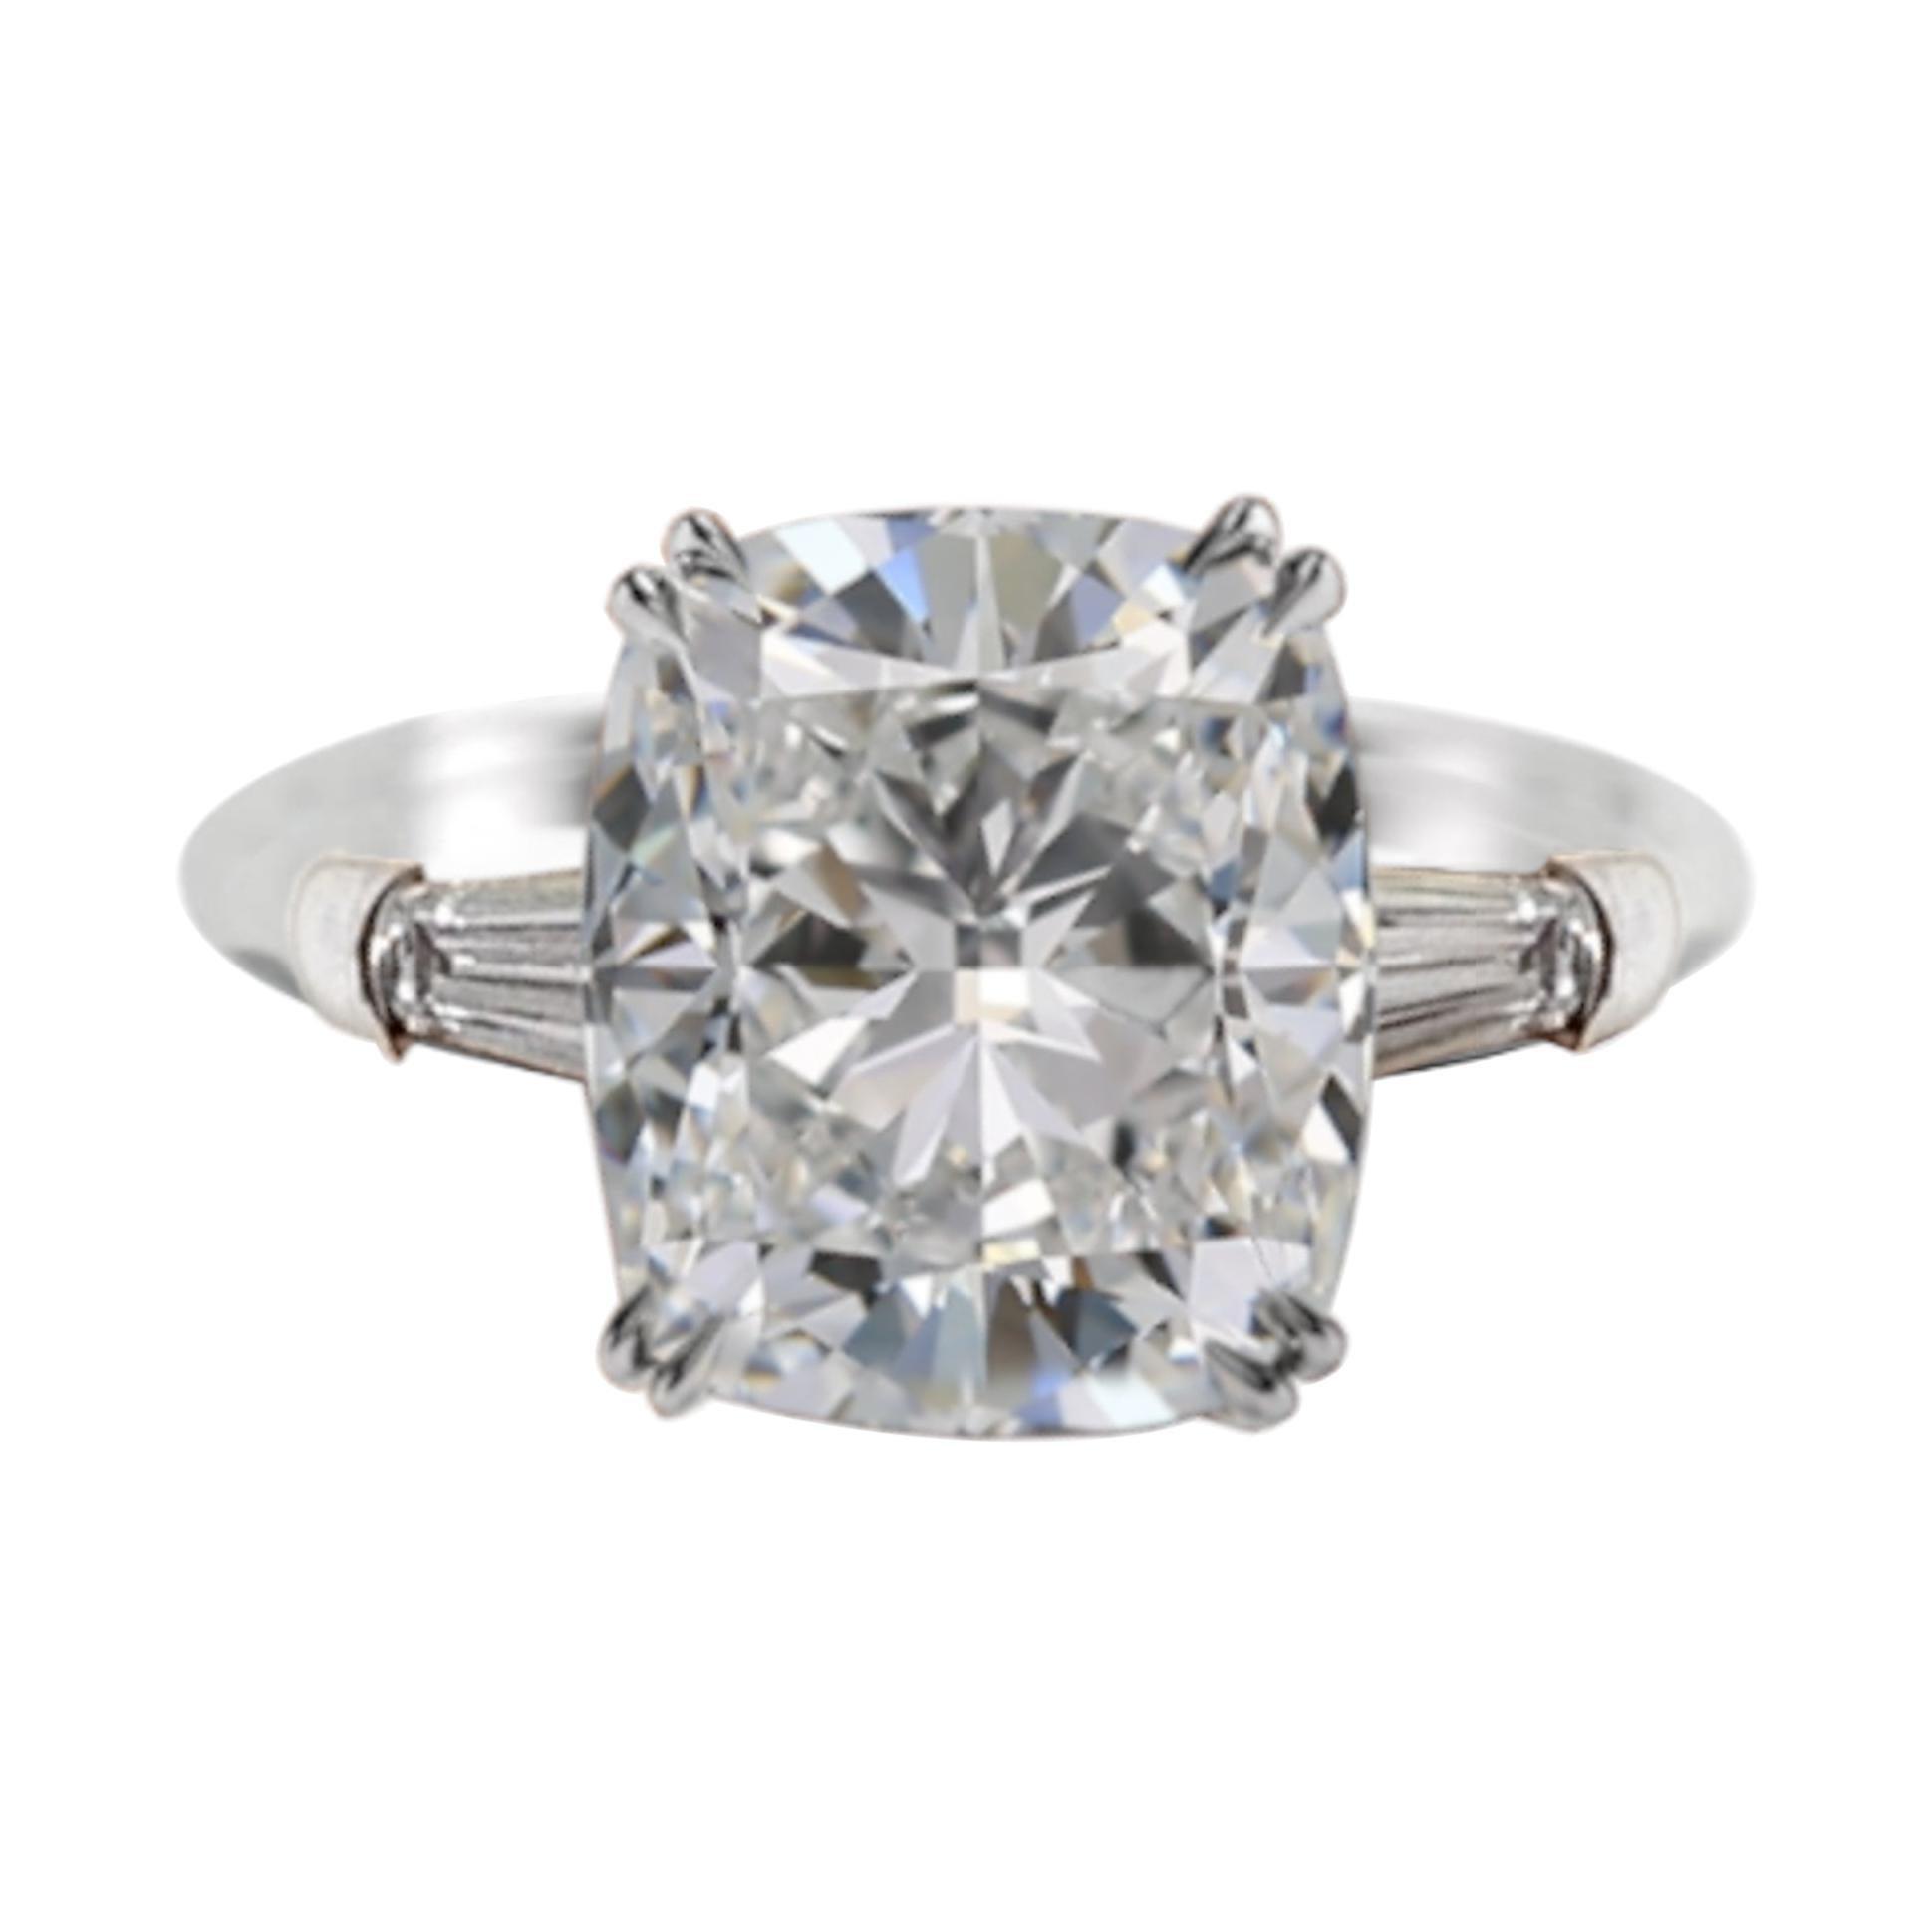 GIA Certified 3.65 Carat Cushion Modified Brilliant Diamond Platinum Ring